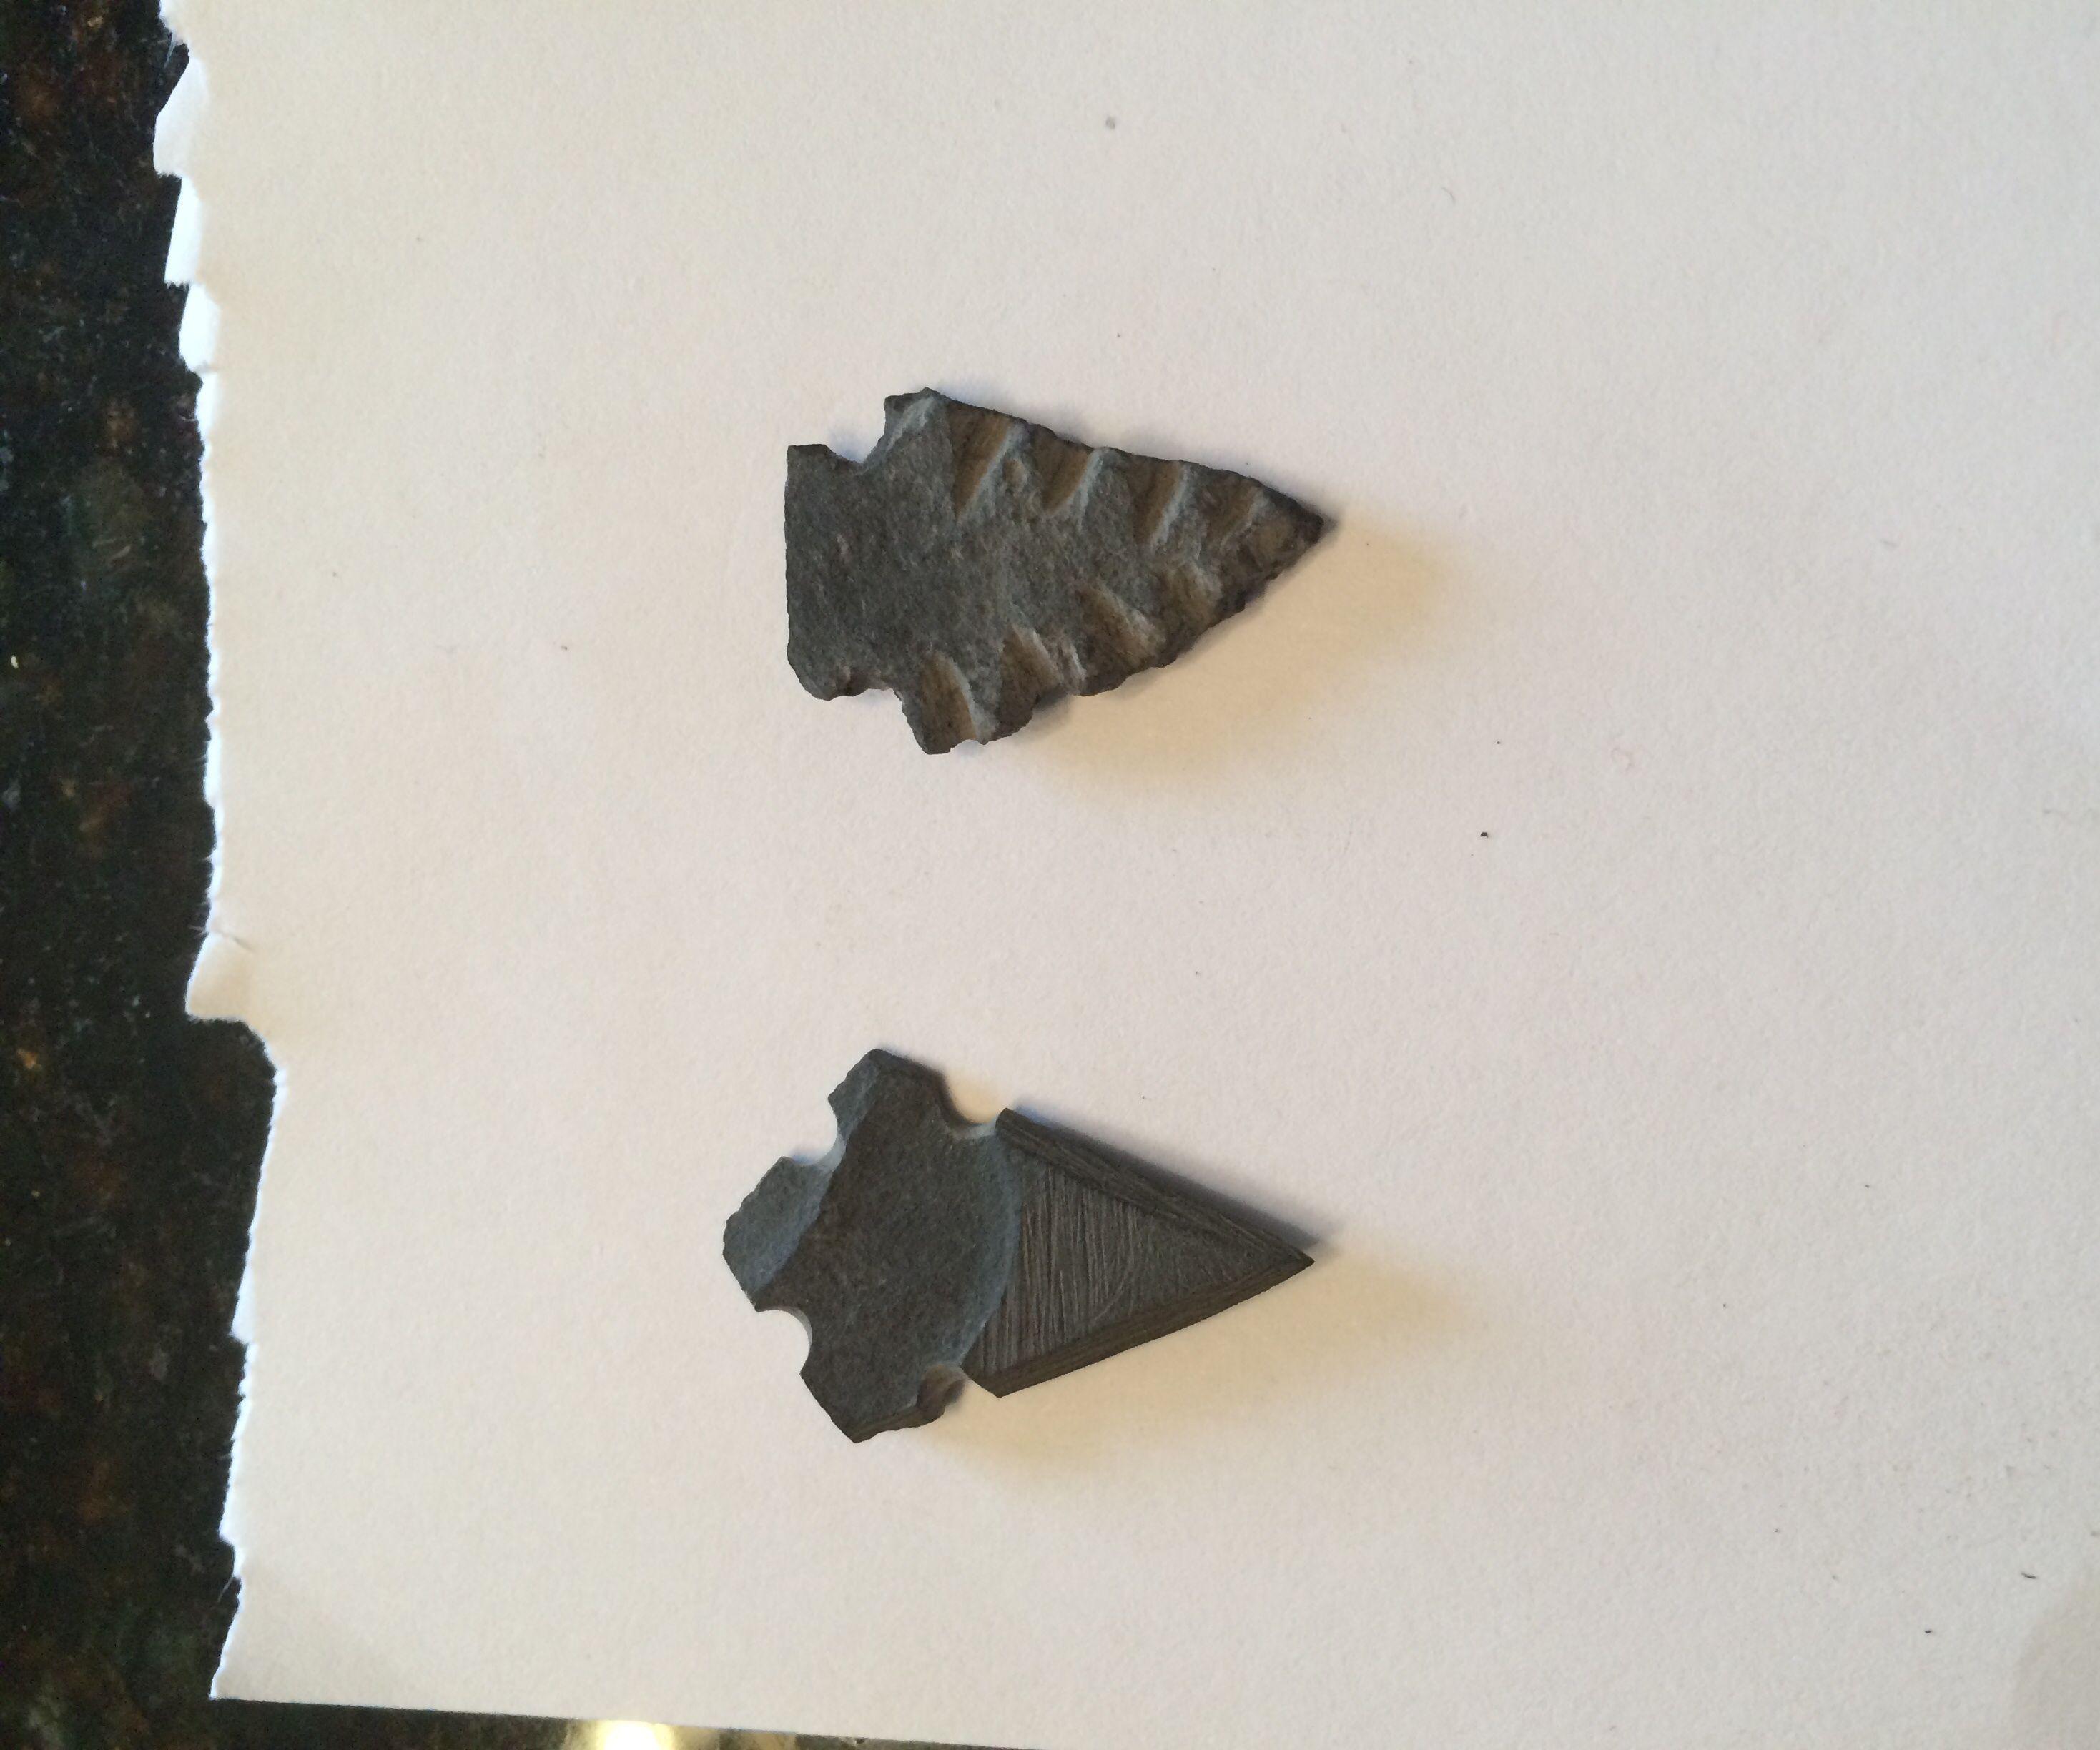 How to Make Stone Arrowheads